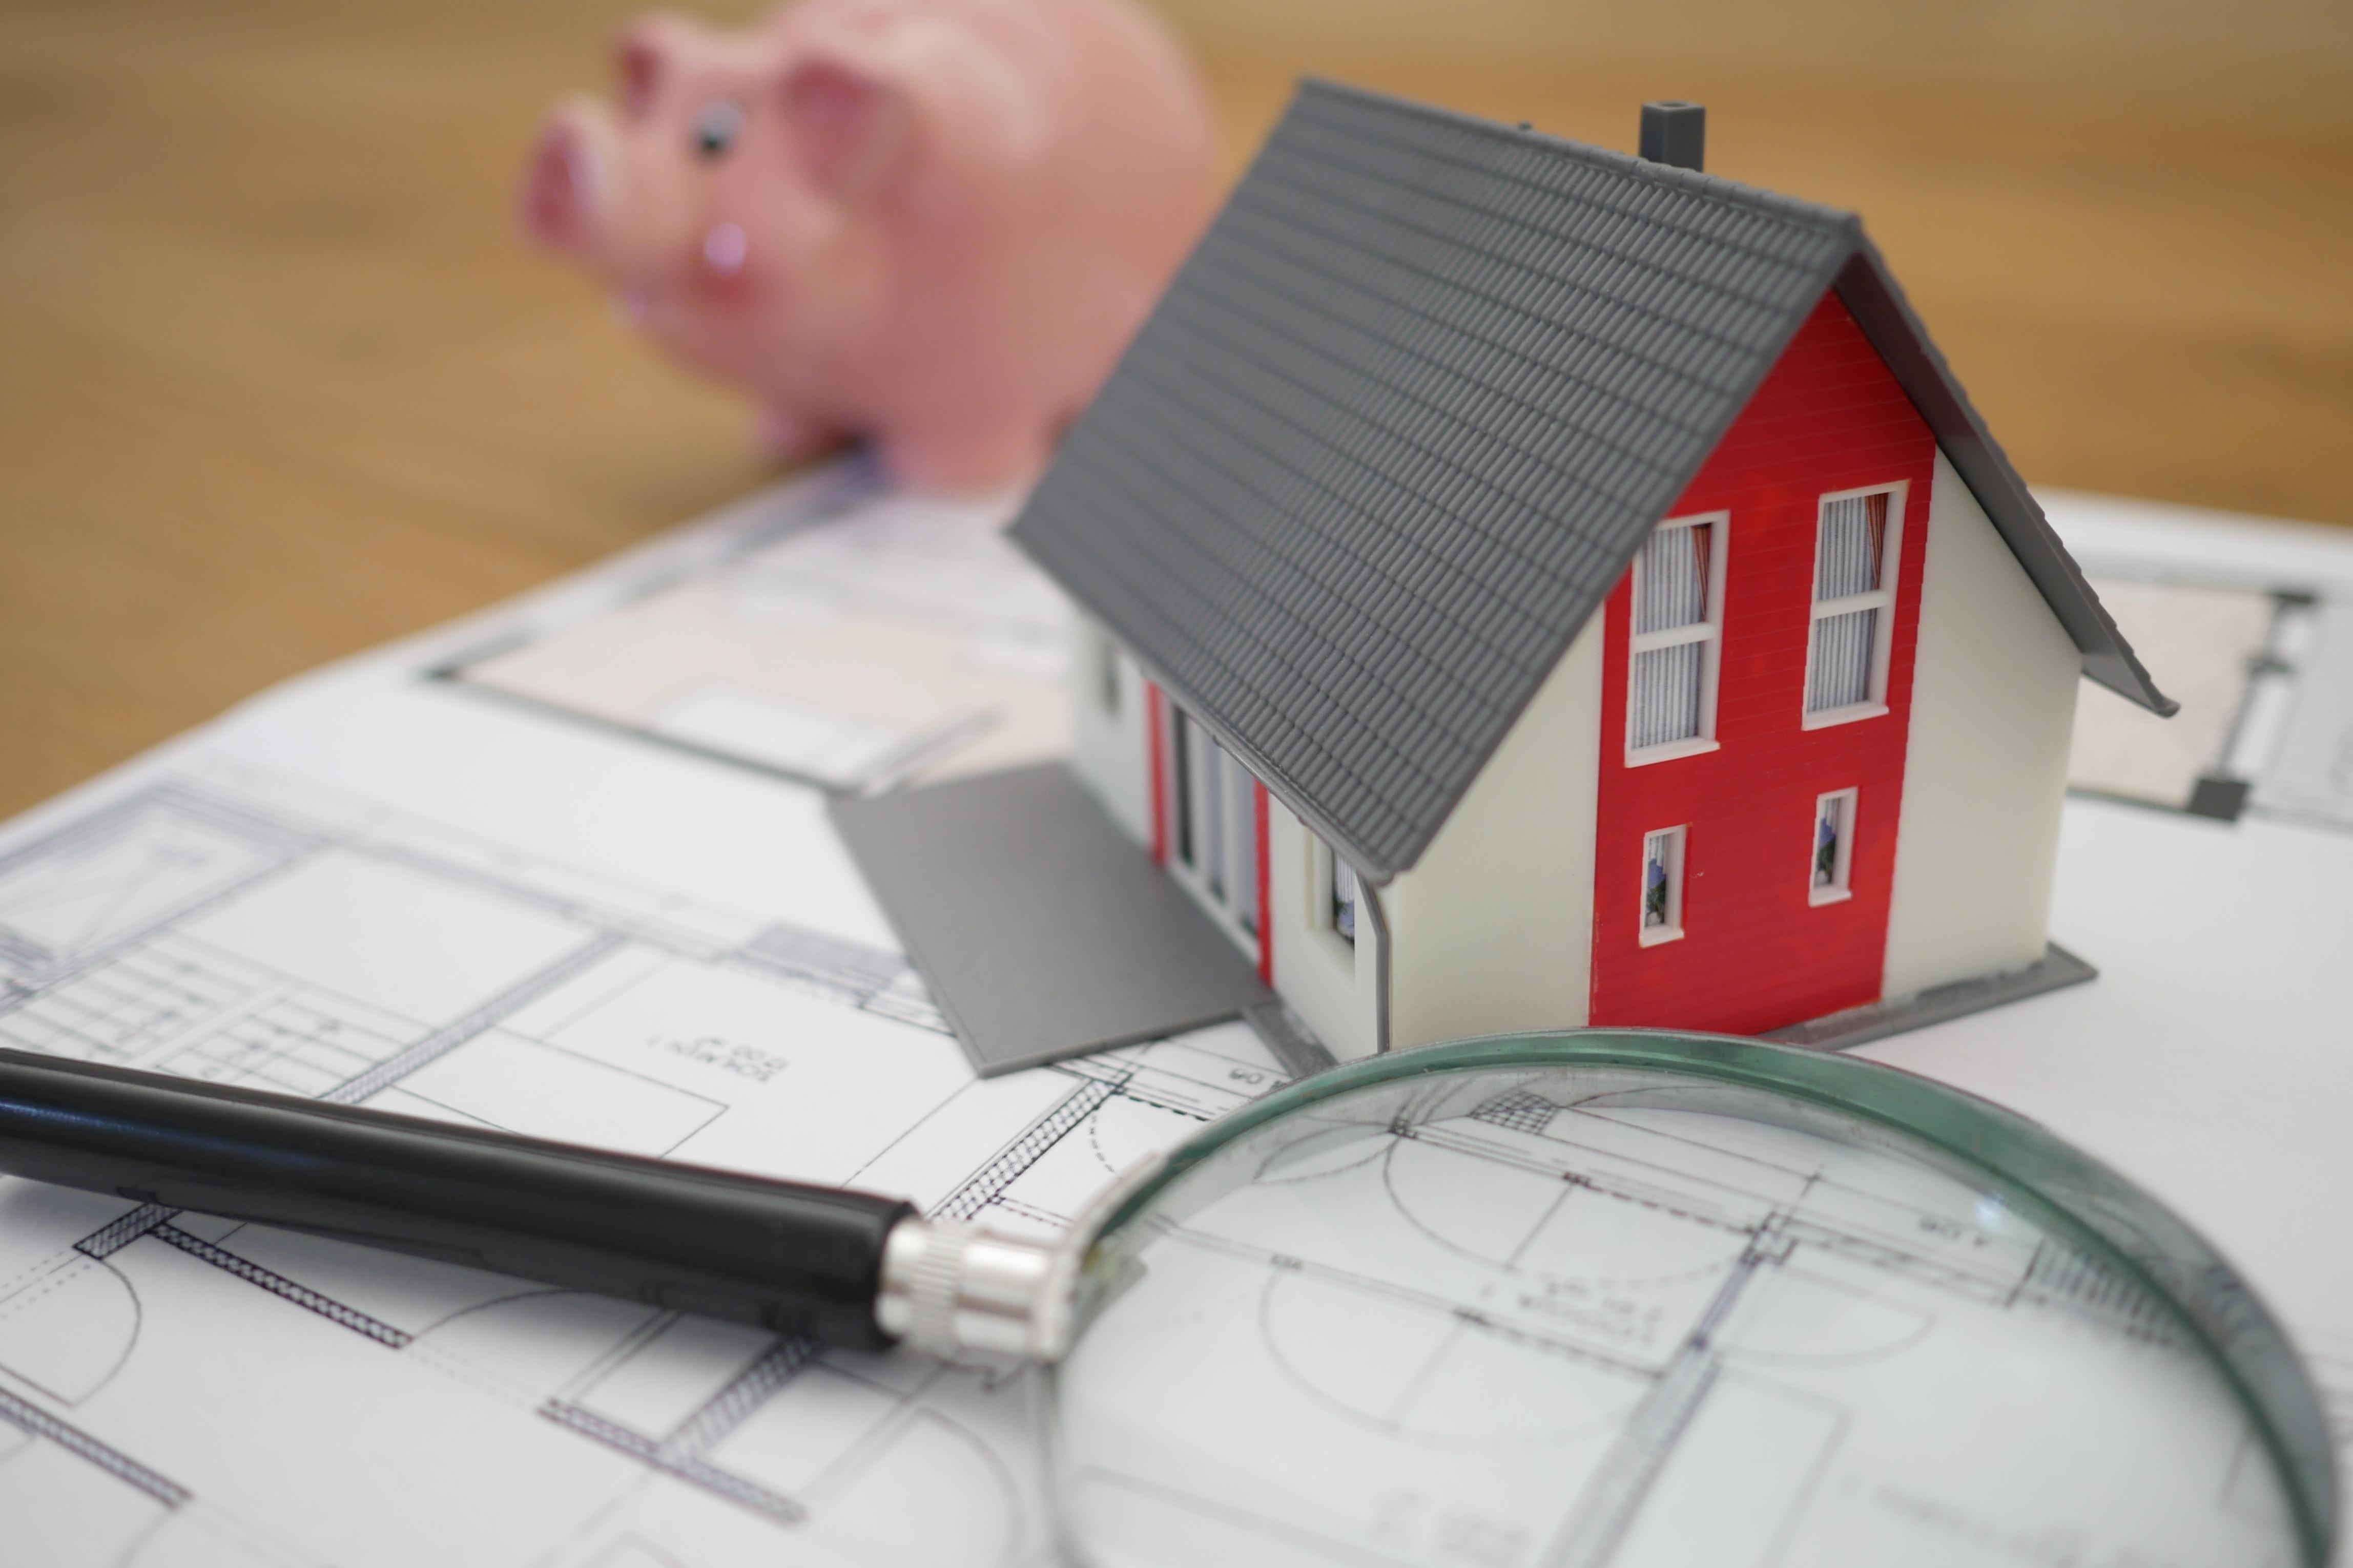 Cesantías para vivienda miniatura